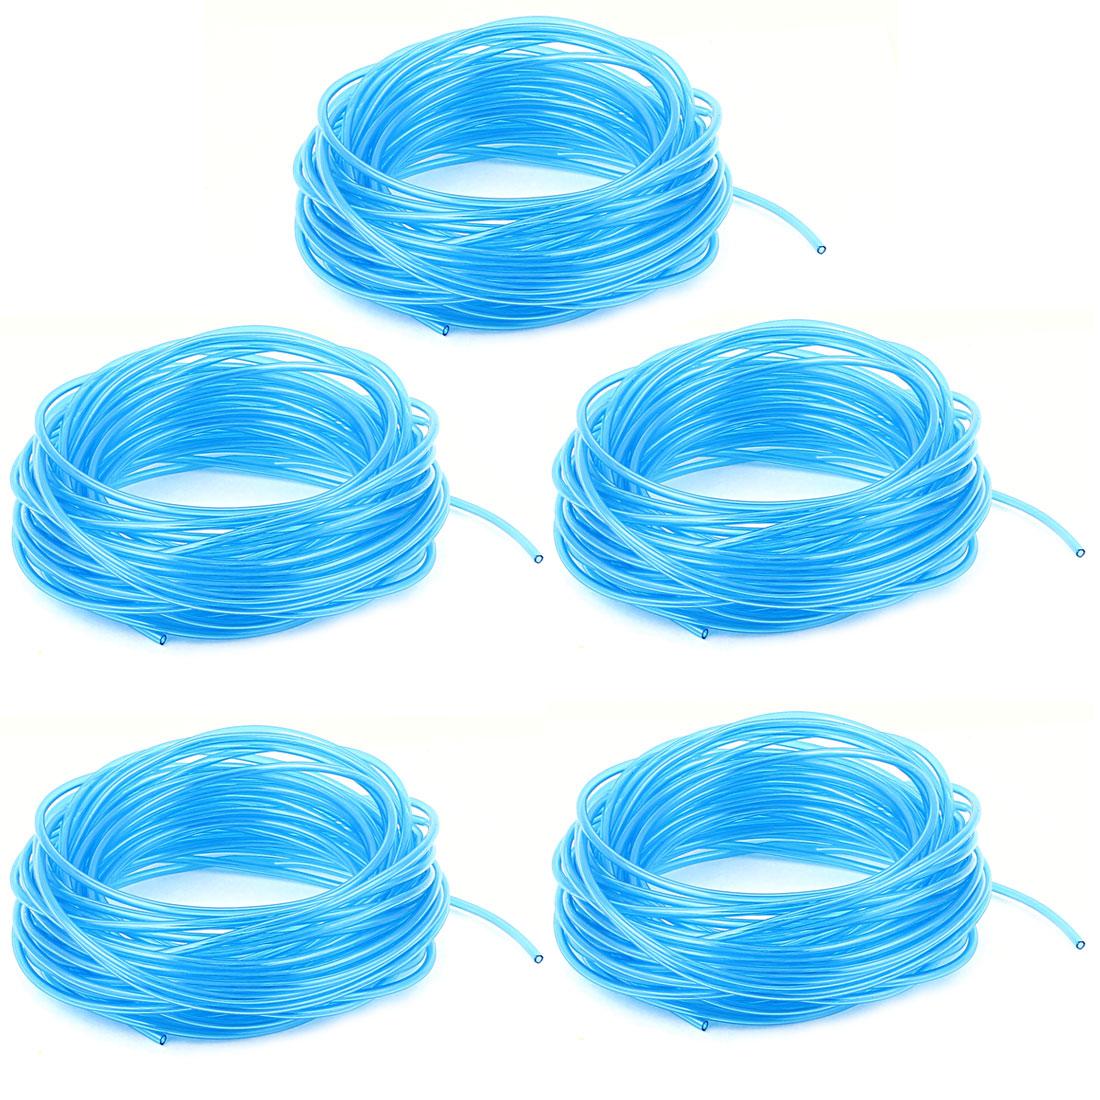 5 Pcs 4mm x 2.5mm Fuel Gas Air Polyurethane PU Tubing Hose Pipe 20M Clear Blue